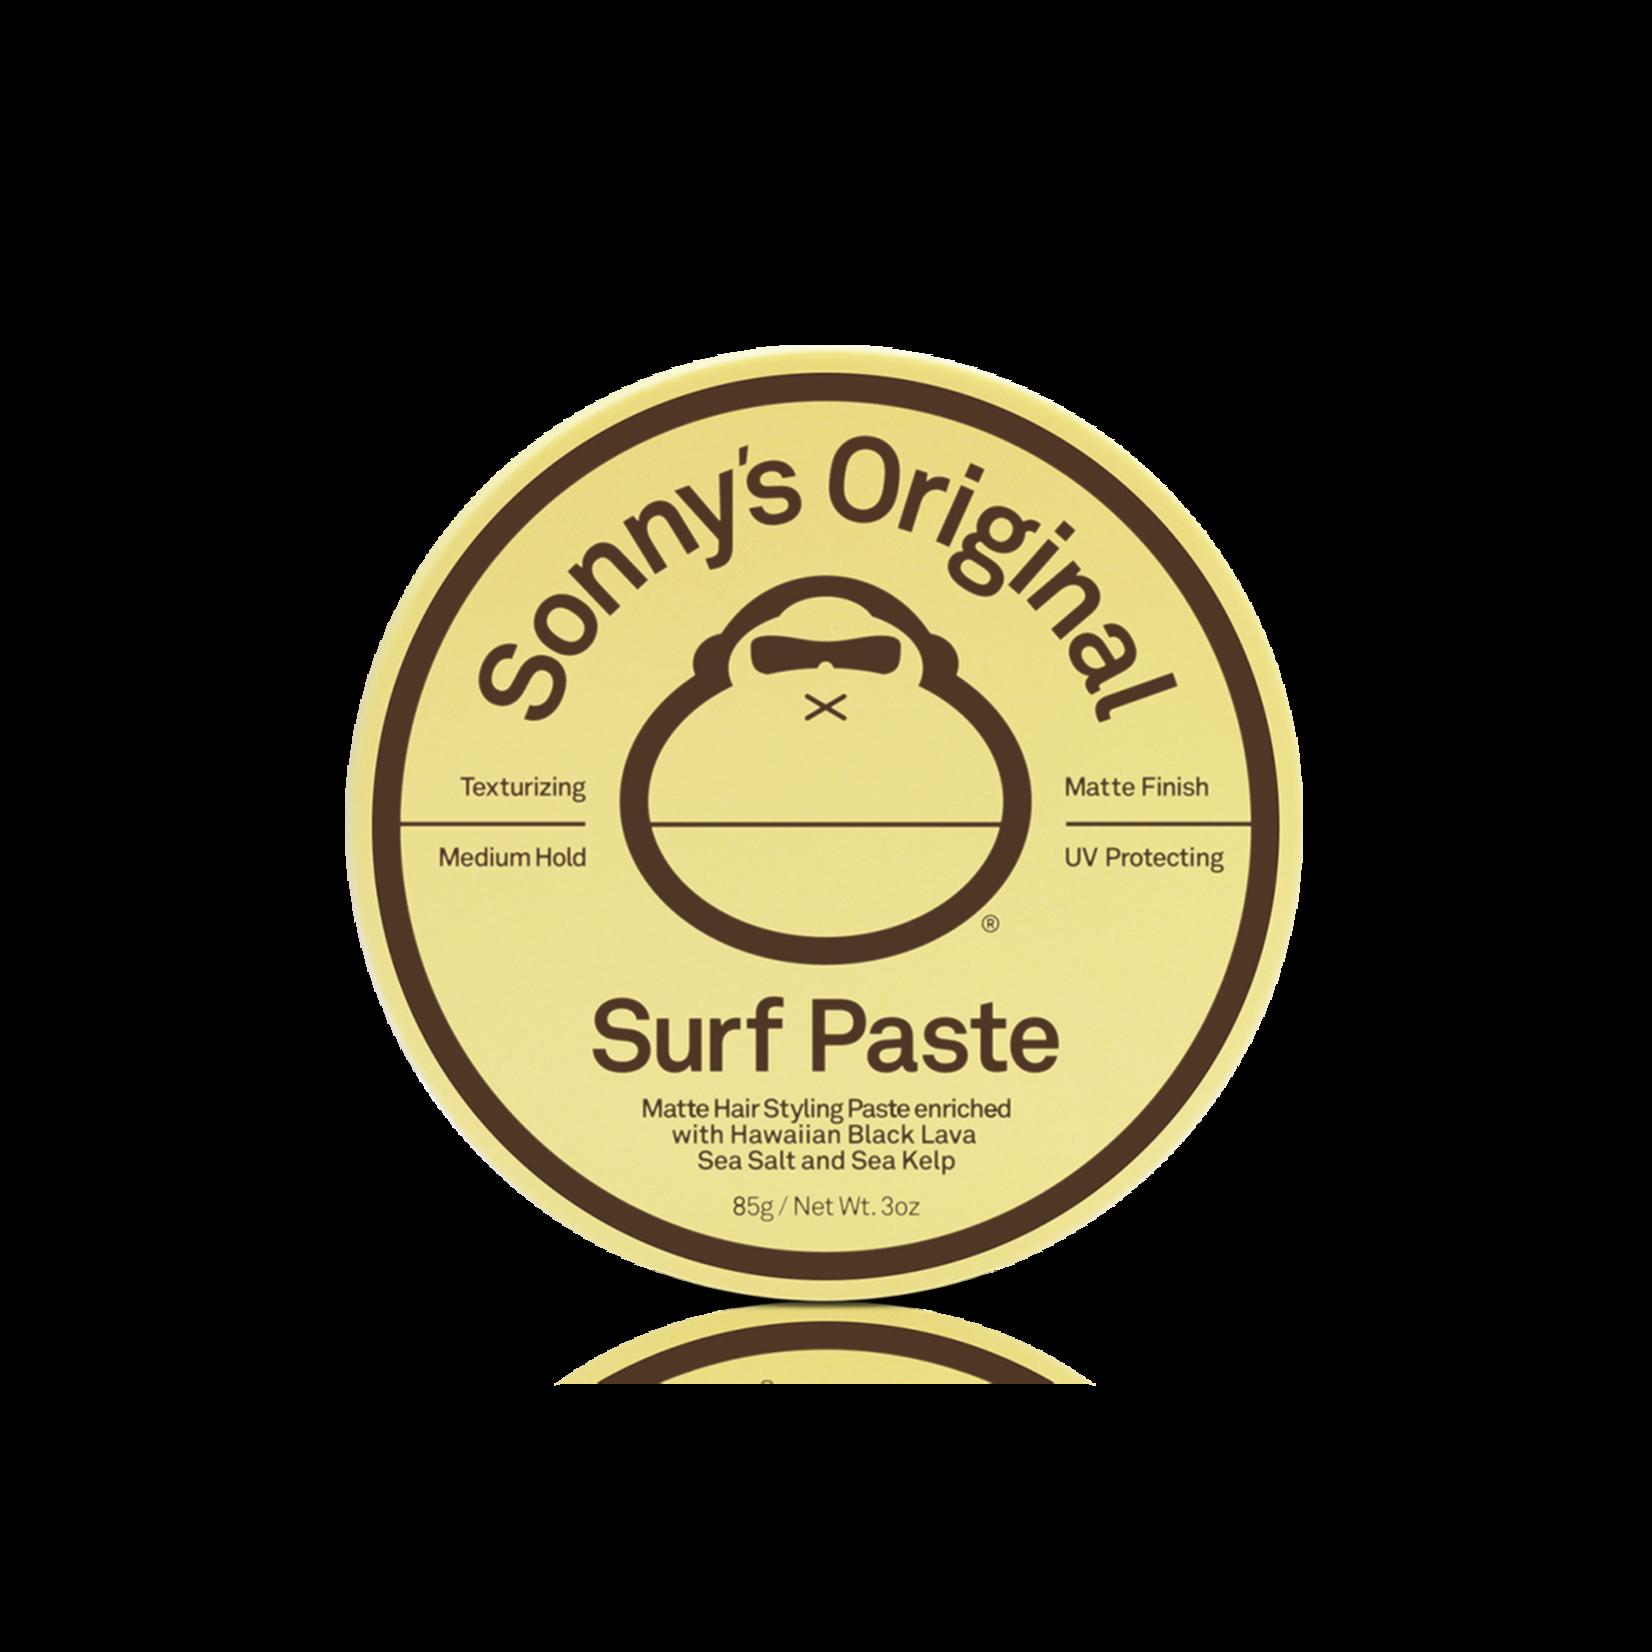 Sun Bum SURF PASTE